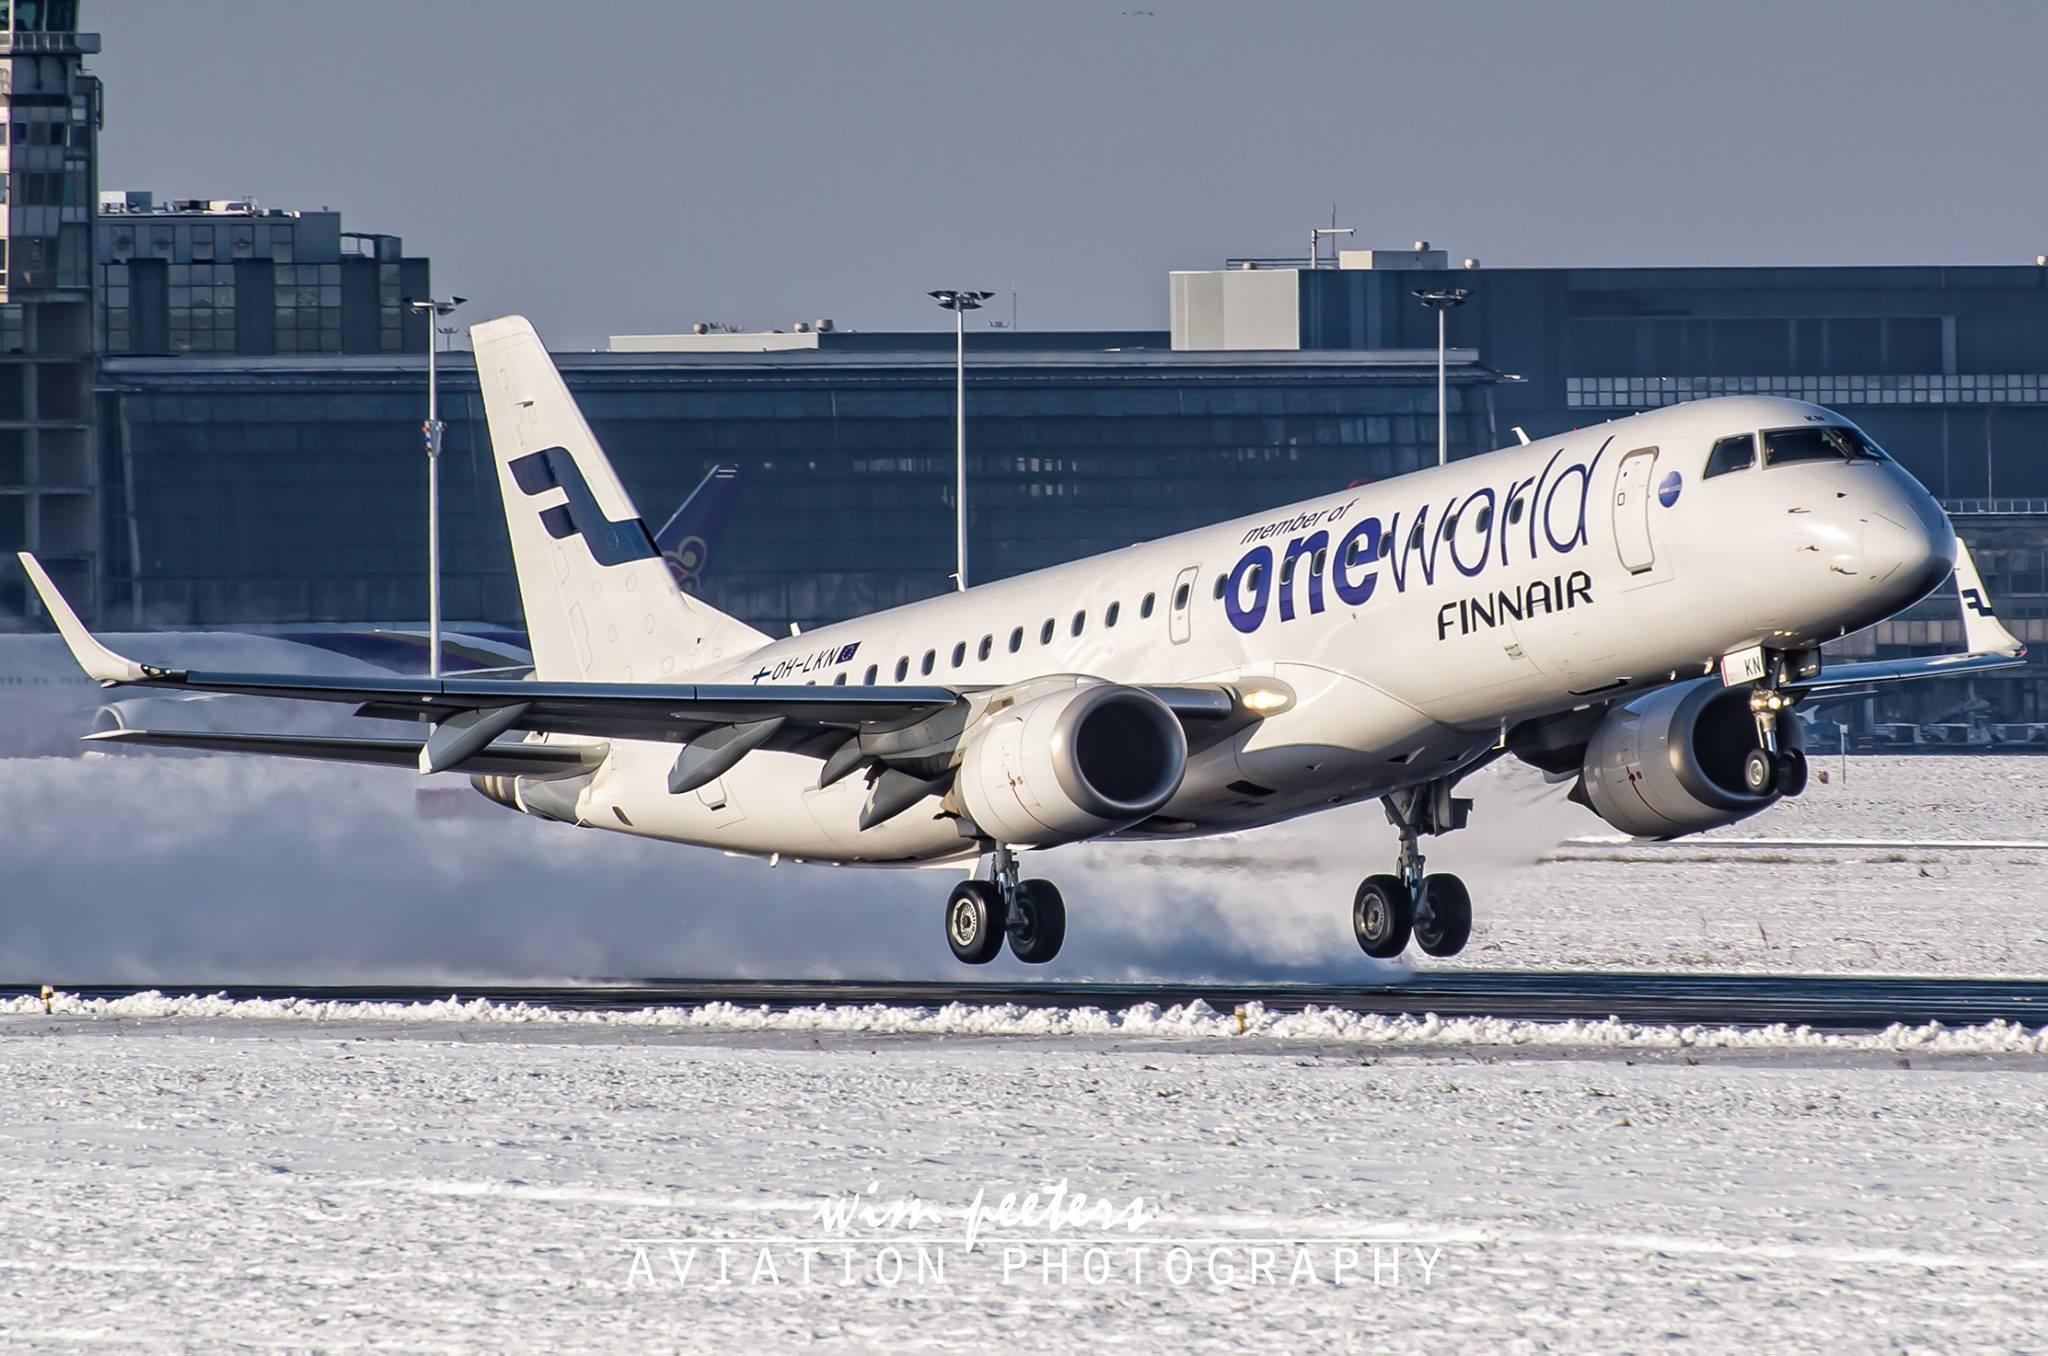 Finnair 'oneworld' Embraer 190 - copyright Wim Peeters